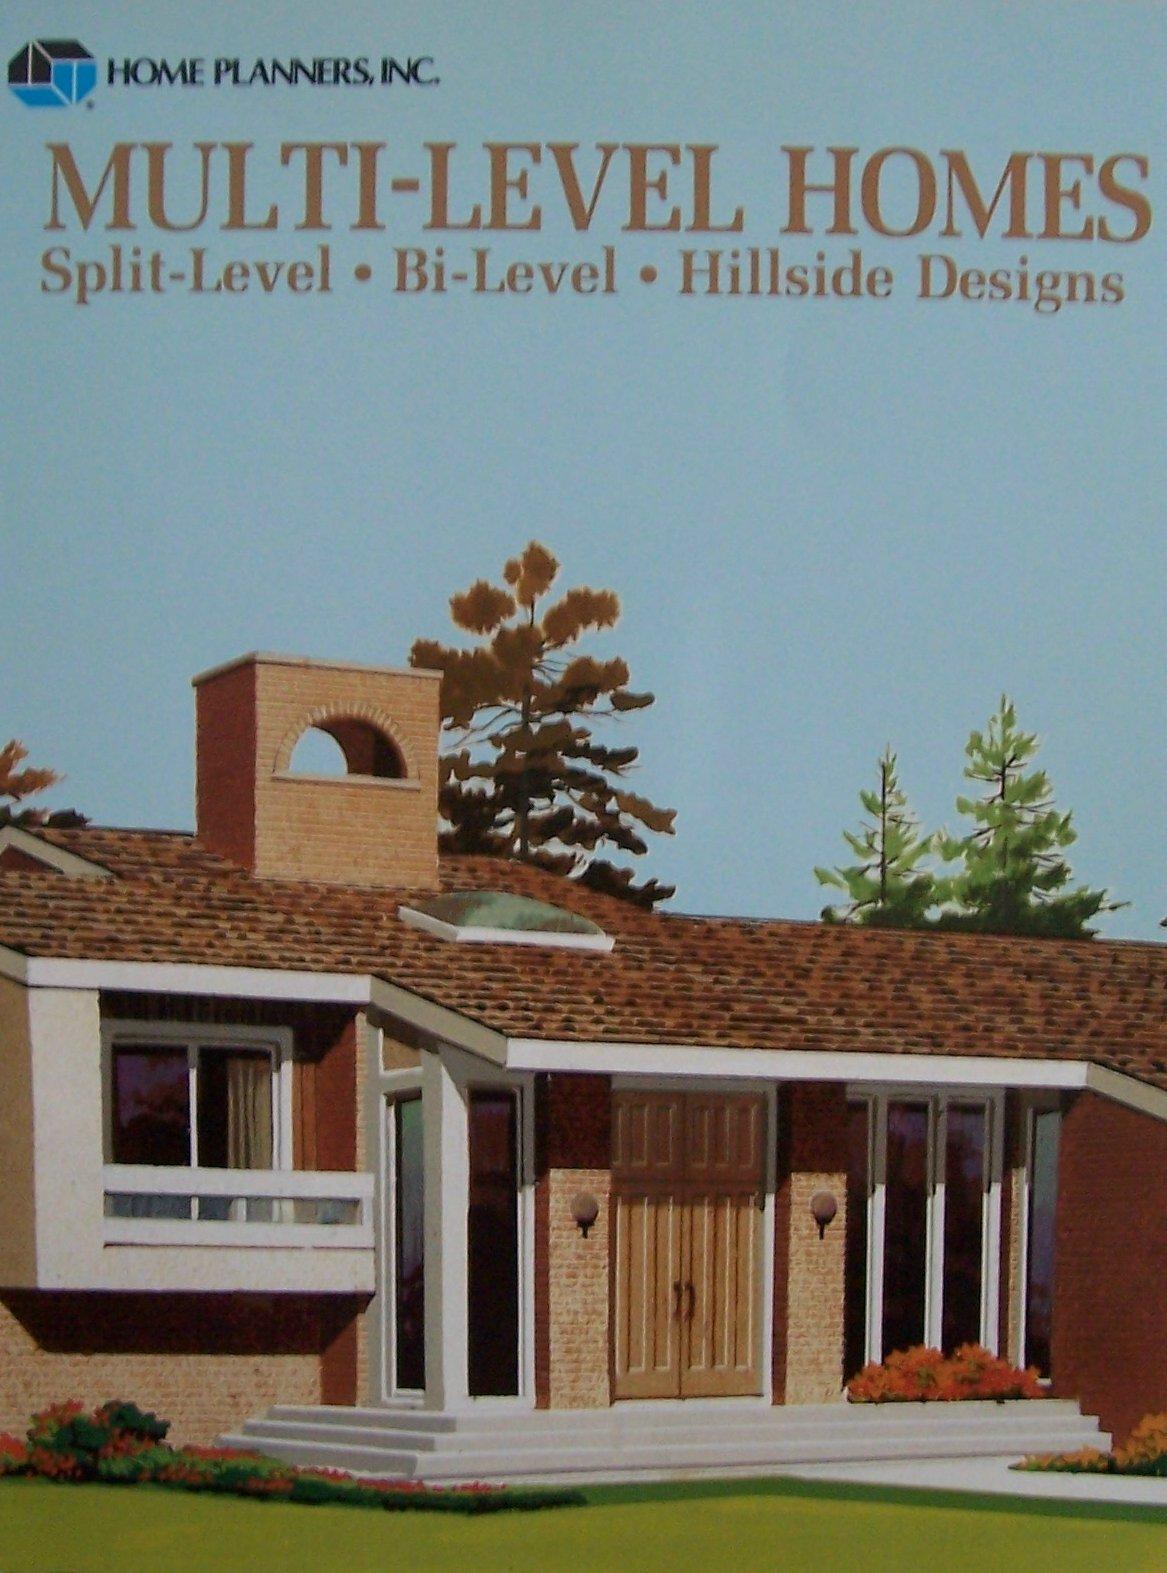 amazon com multi level homes split level bi level hillside amazon com multi level homes split level bi level hillside designs 9780918894533 inc home planners books